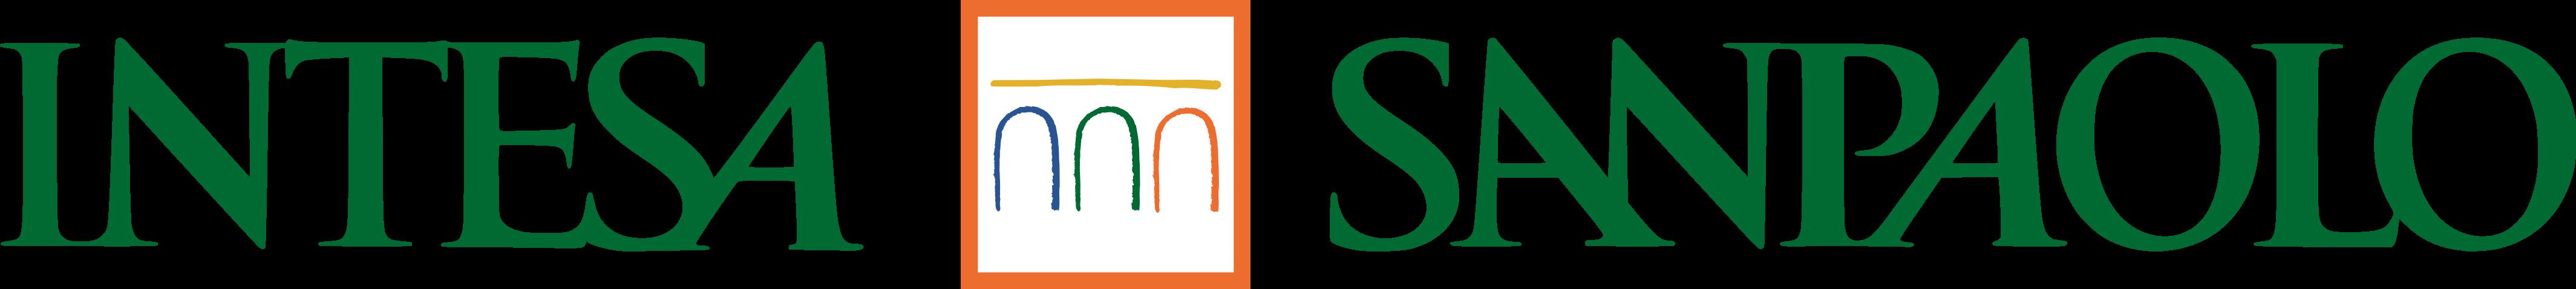 Bancomat Intesa Sanpaolo